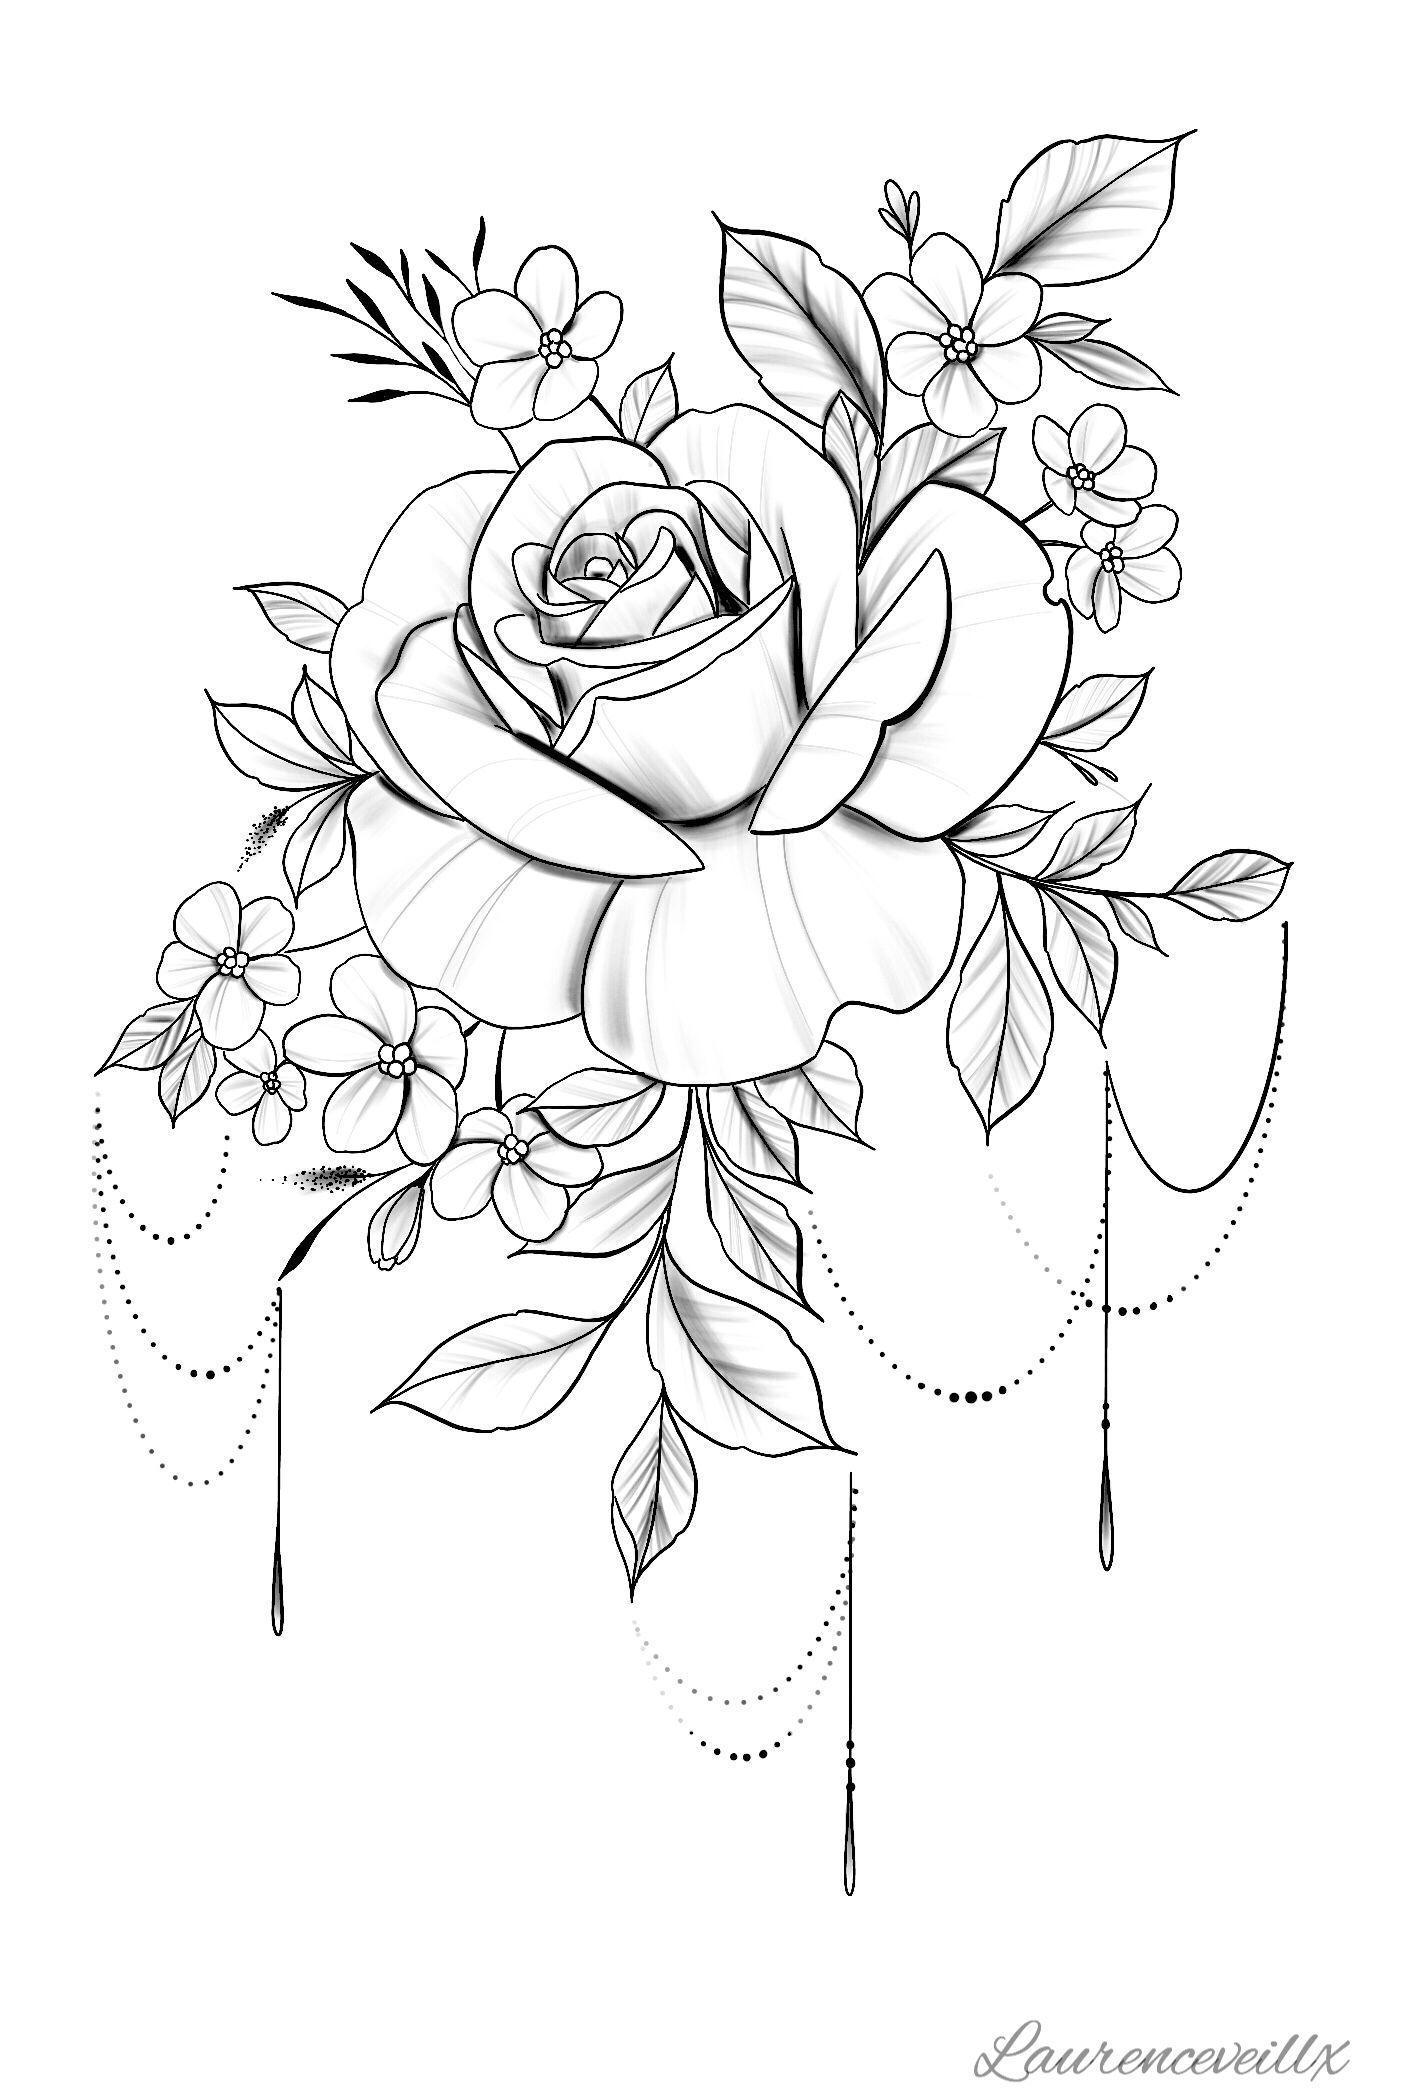 Tattoo Rose Flower Tattoo Design Available Instant Download Etsy Rose Flower Tattoos Rose Tattoo Design Printable Tattoos